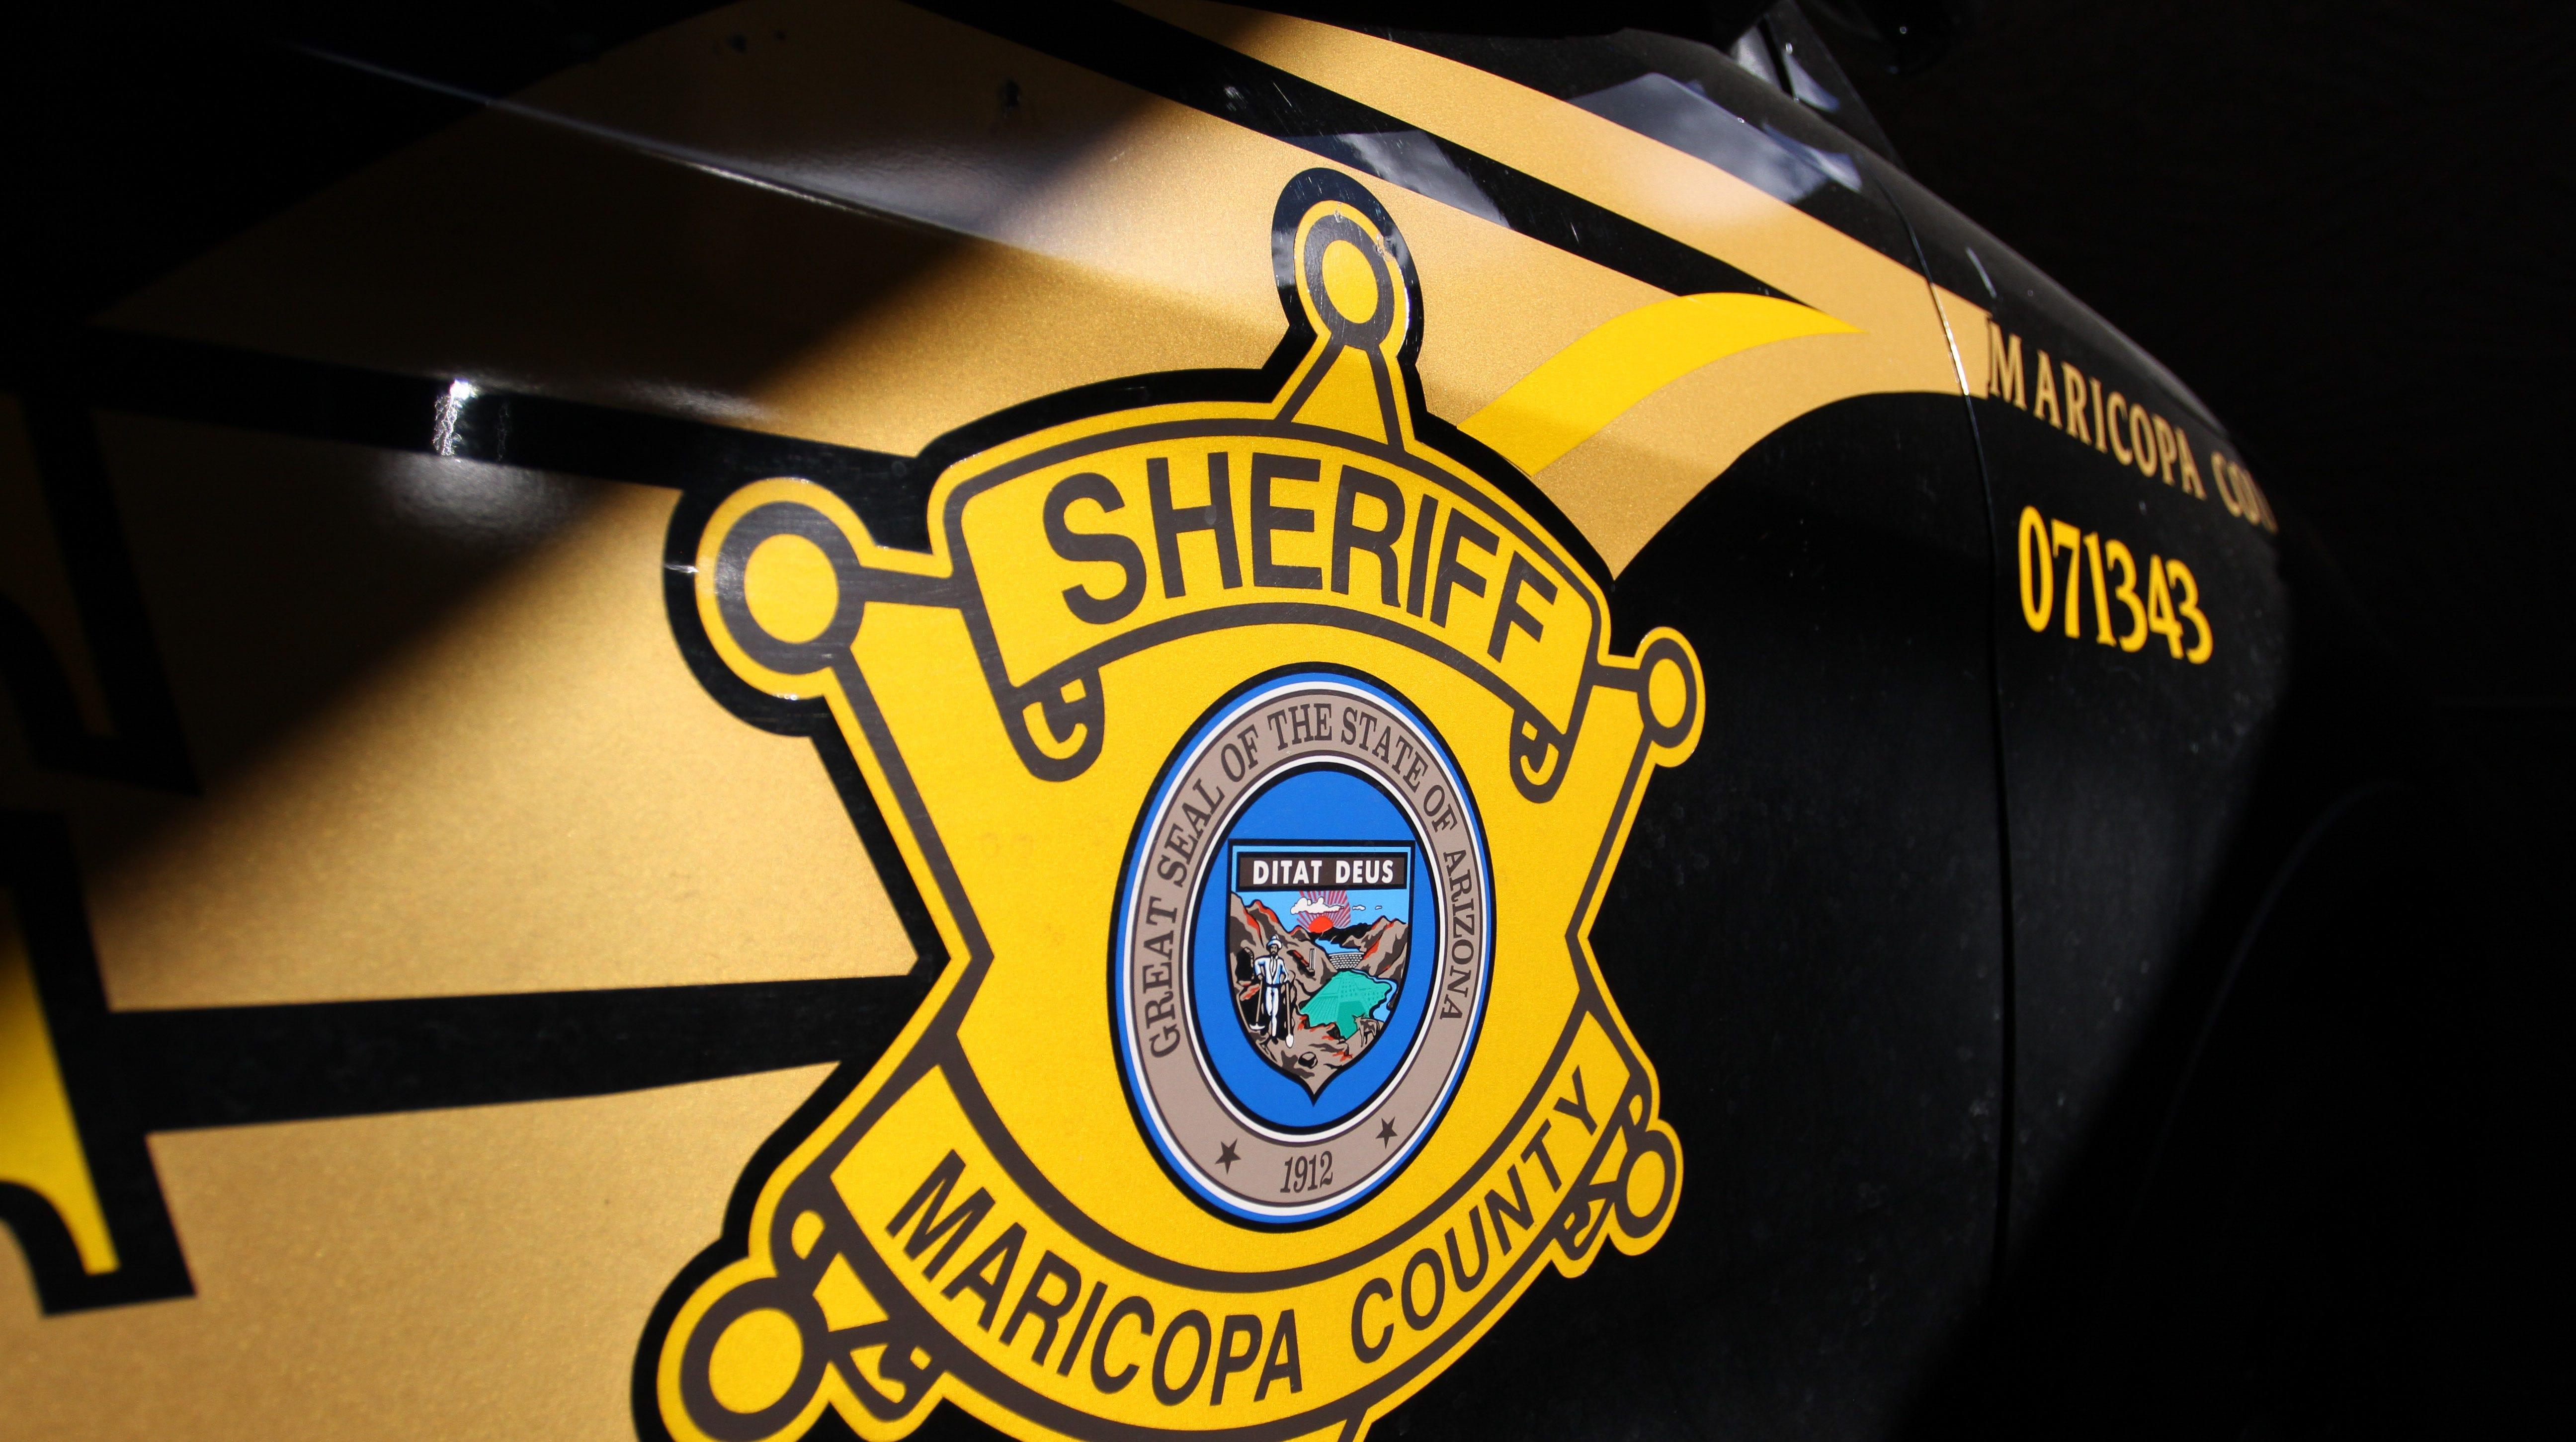 MCSO: Detectives investigating Tonopah homicide